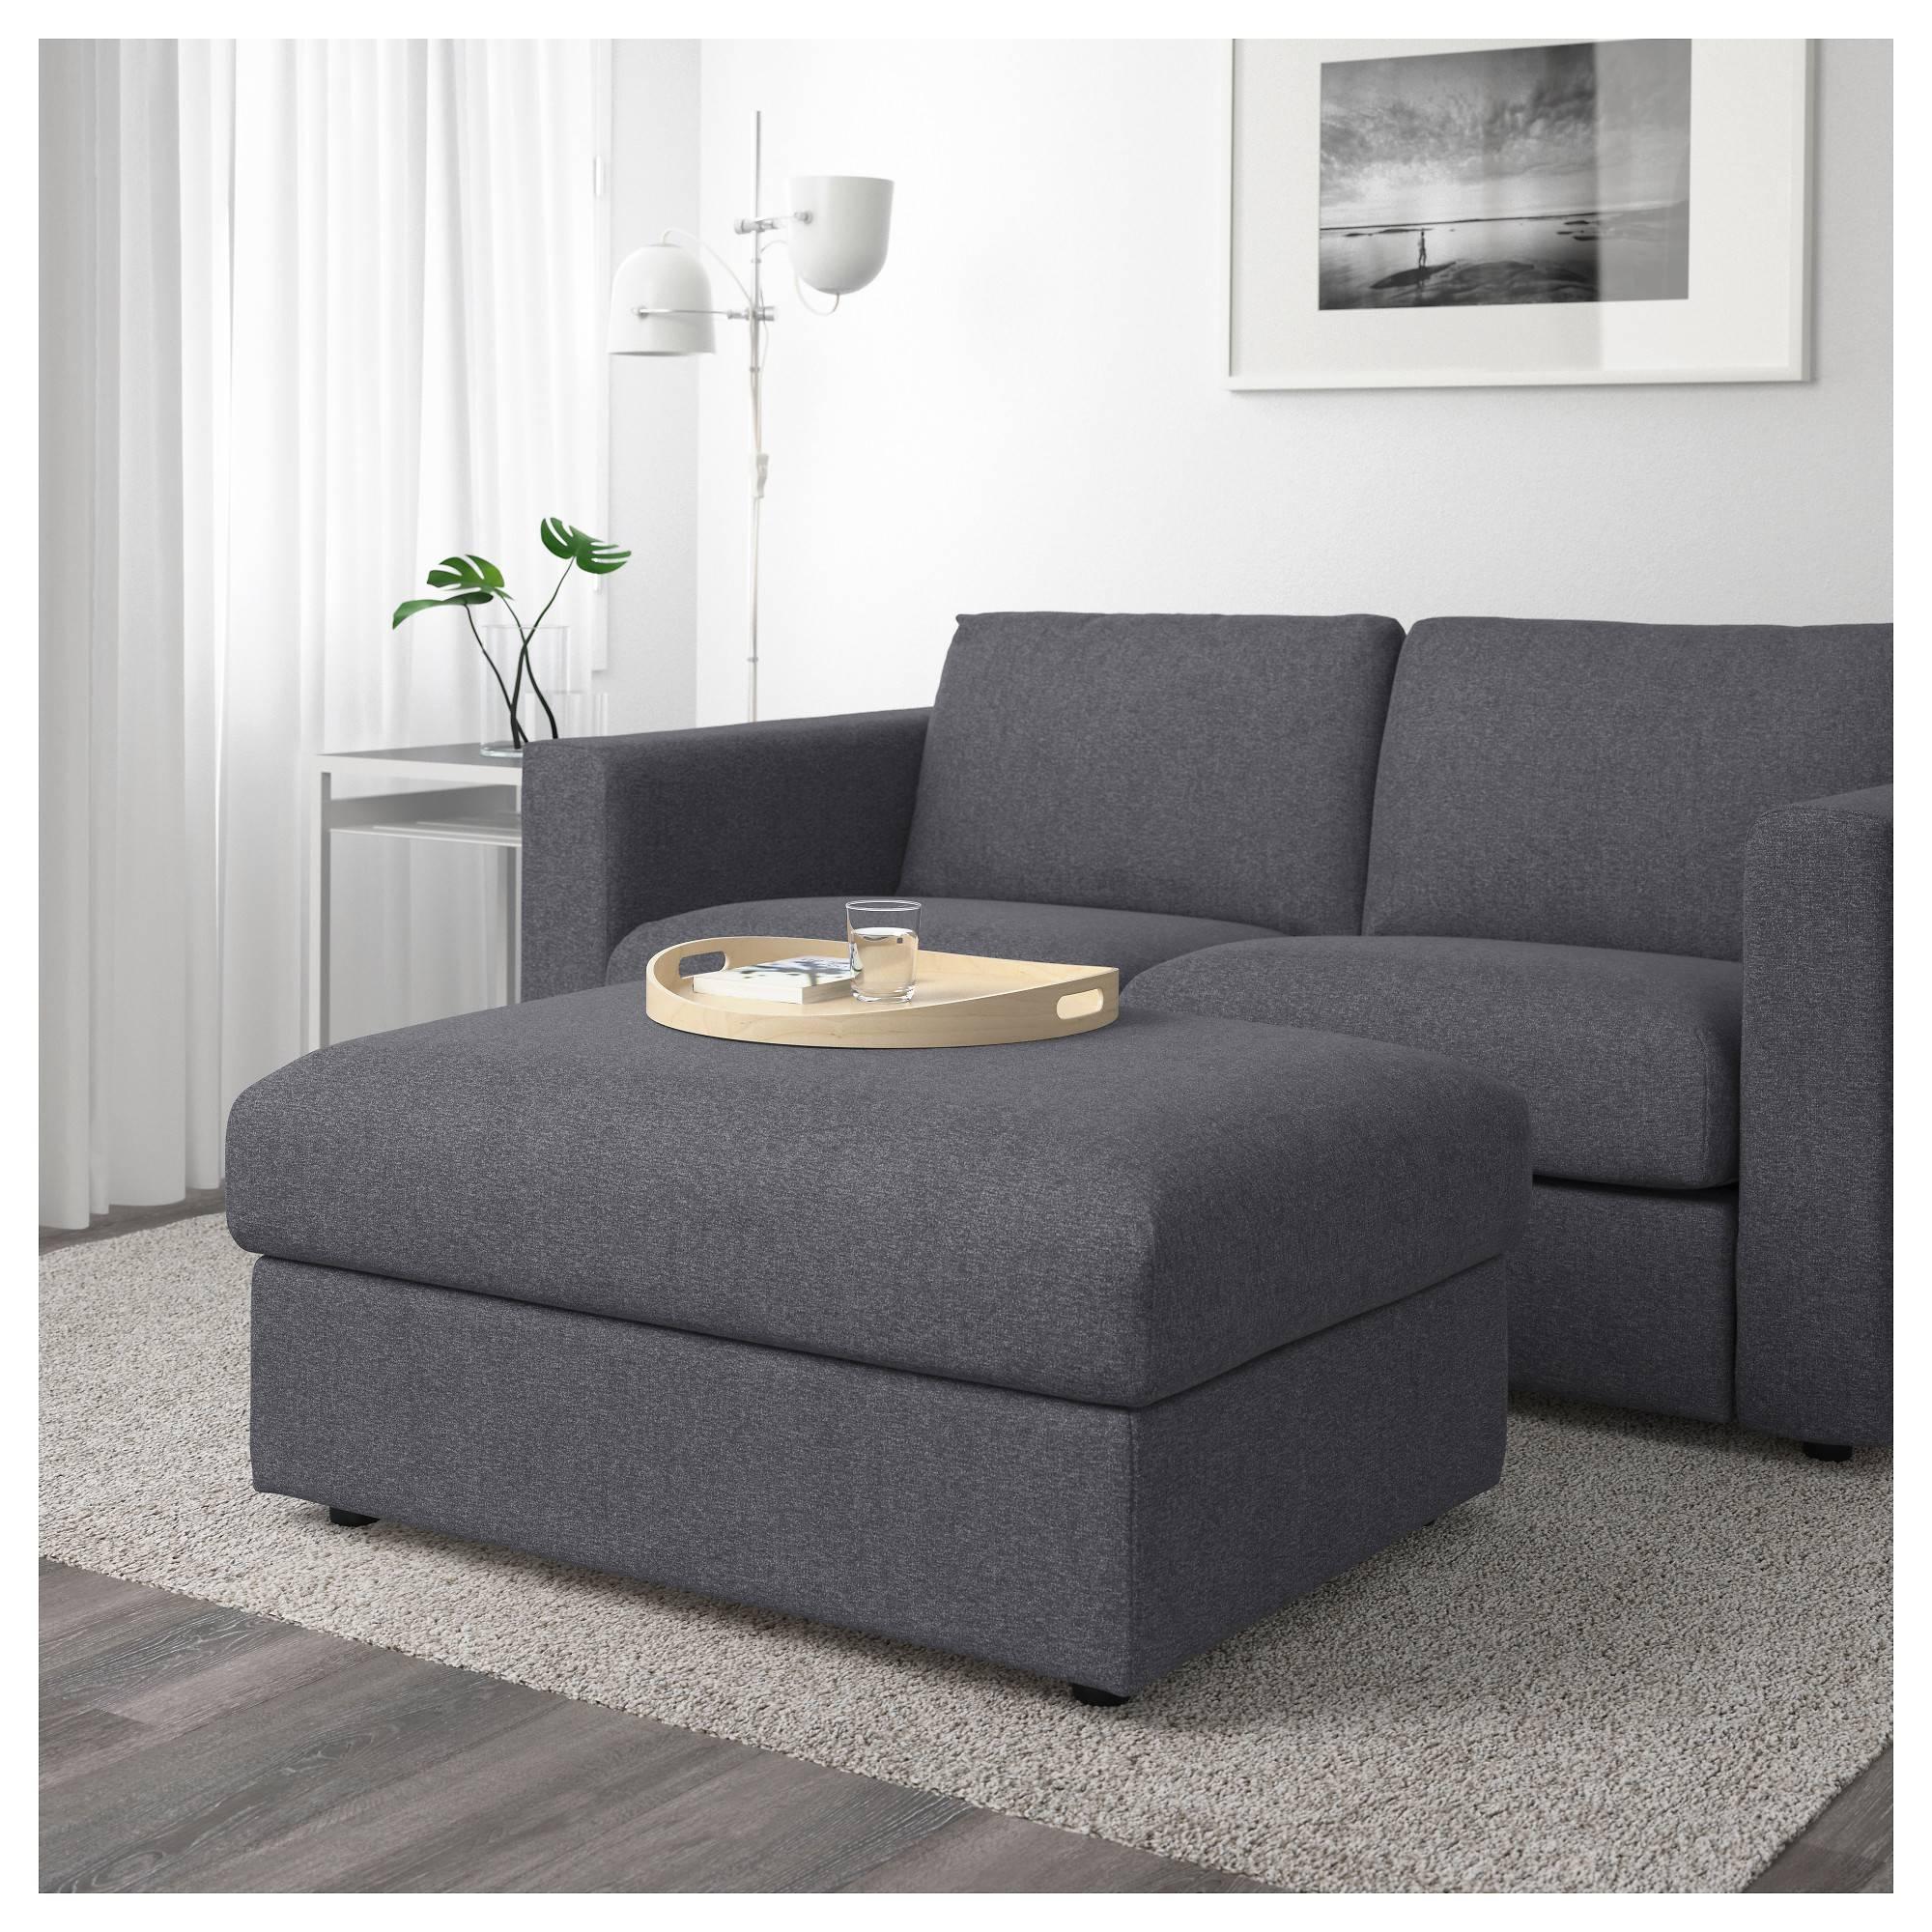 Vimle Footstool With Storage Gunnared Medium Grey - Ikea inside Storage Sofas Ikea (Image 23 of 25)